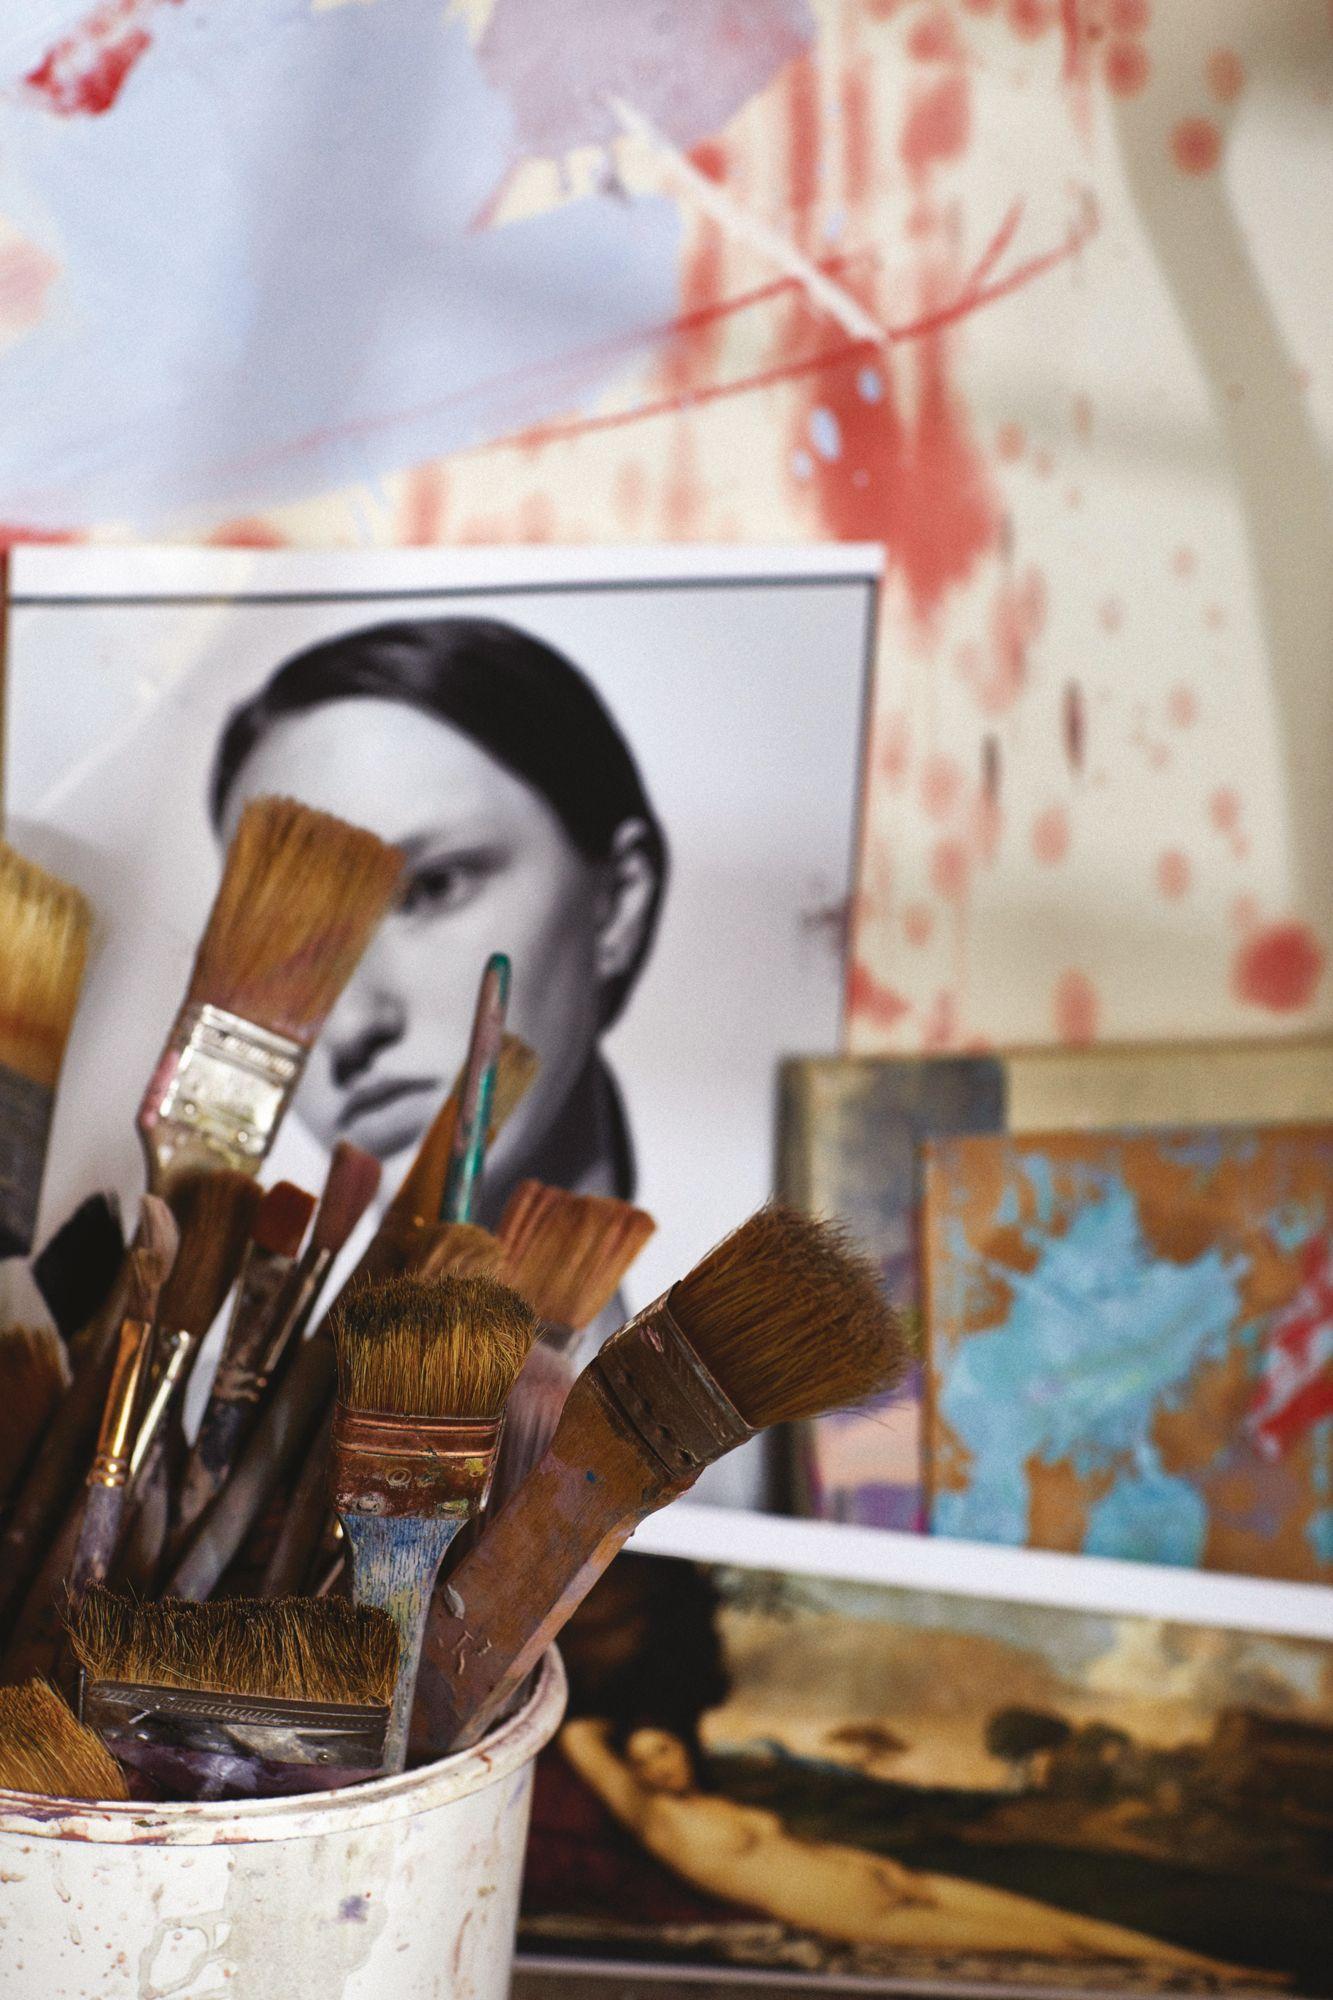 Saville的繪畫工具和材料。(Photo: Amanda Fordyce for Tatler Hong Kong)